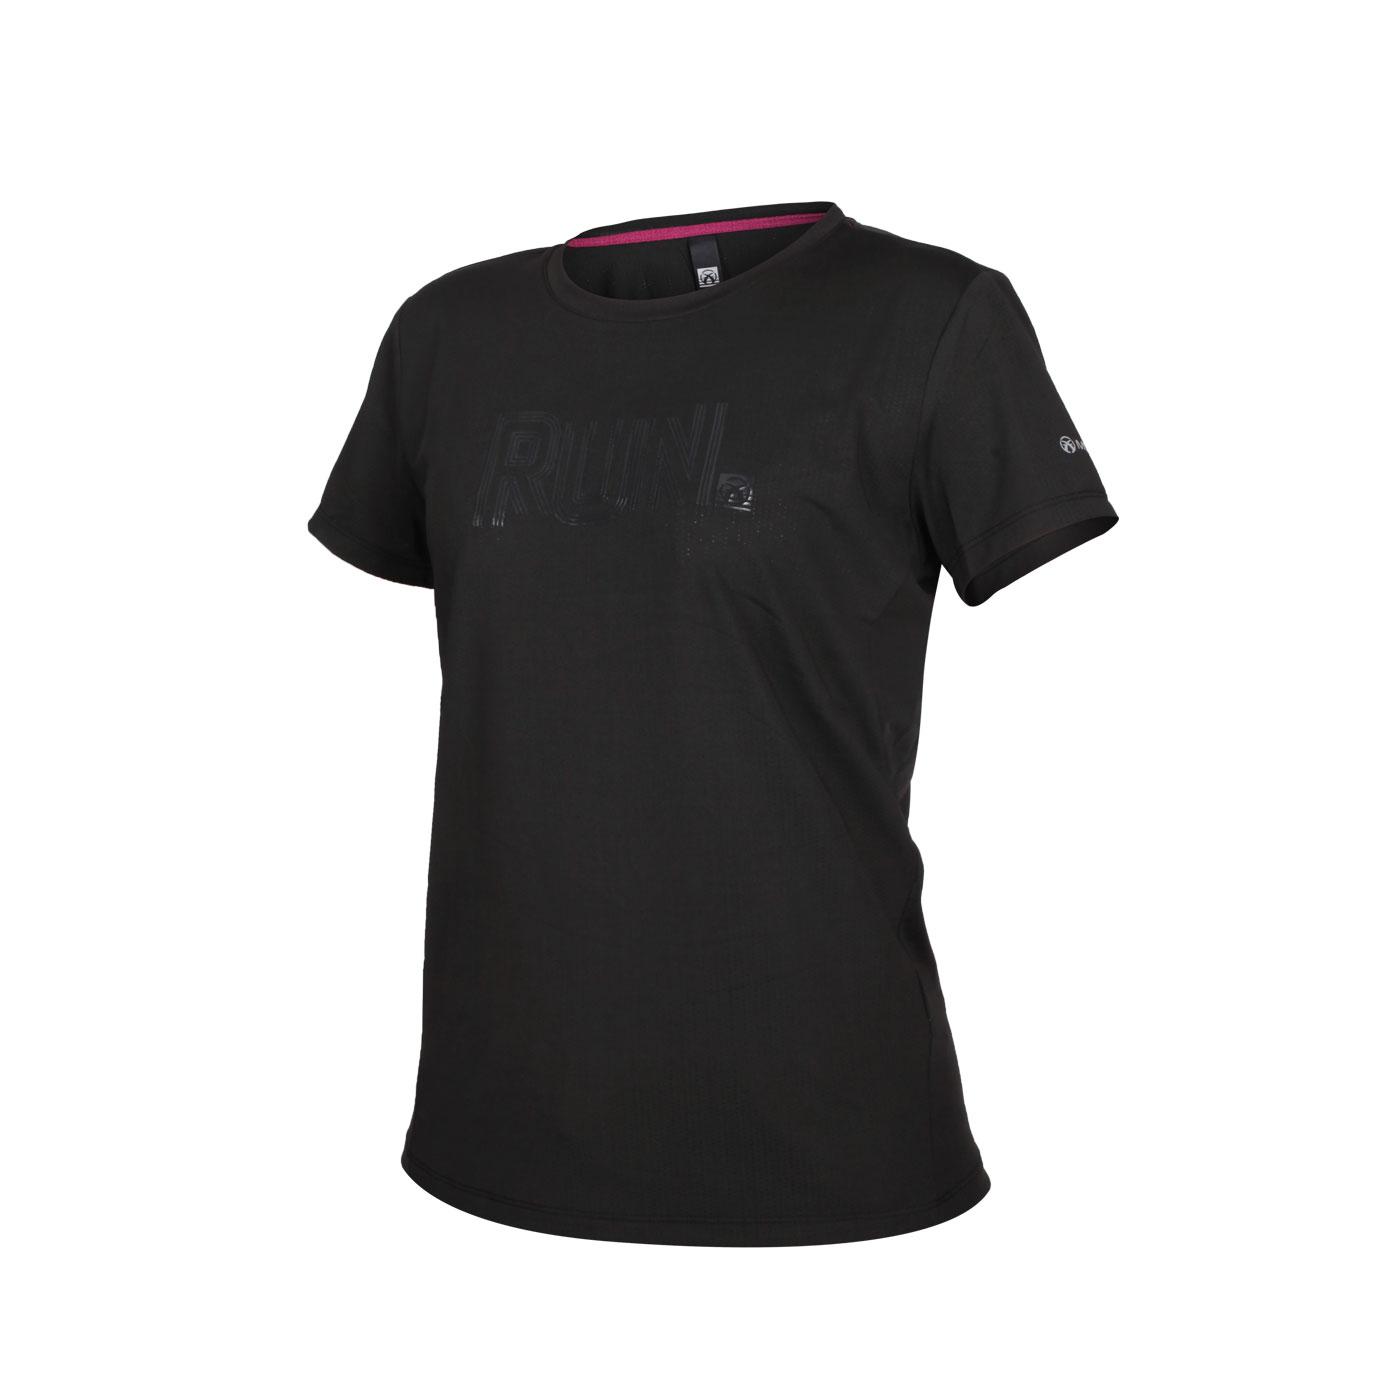 FIRESTAR 女款彈性印花圓領短袖T恤 DL062-10 - 黑